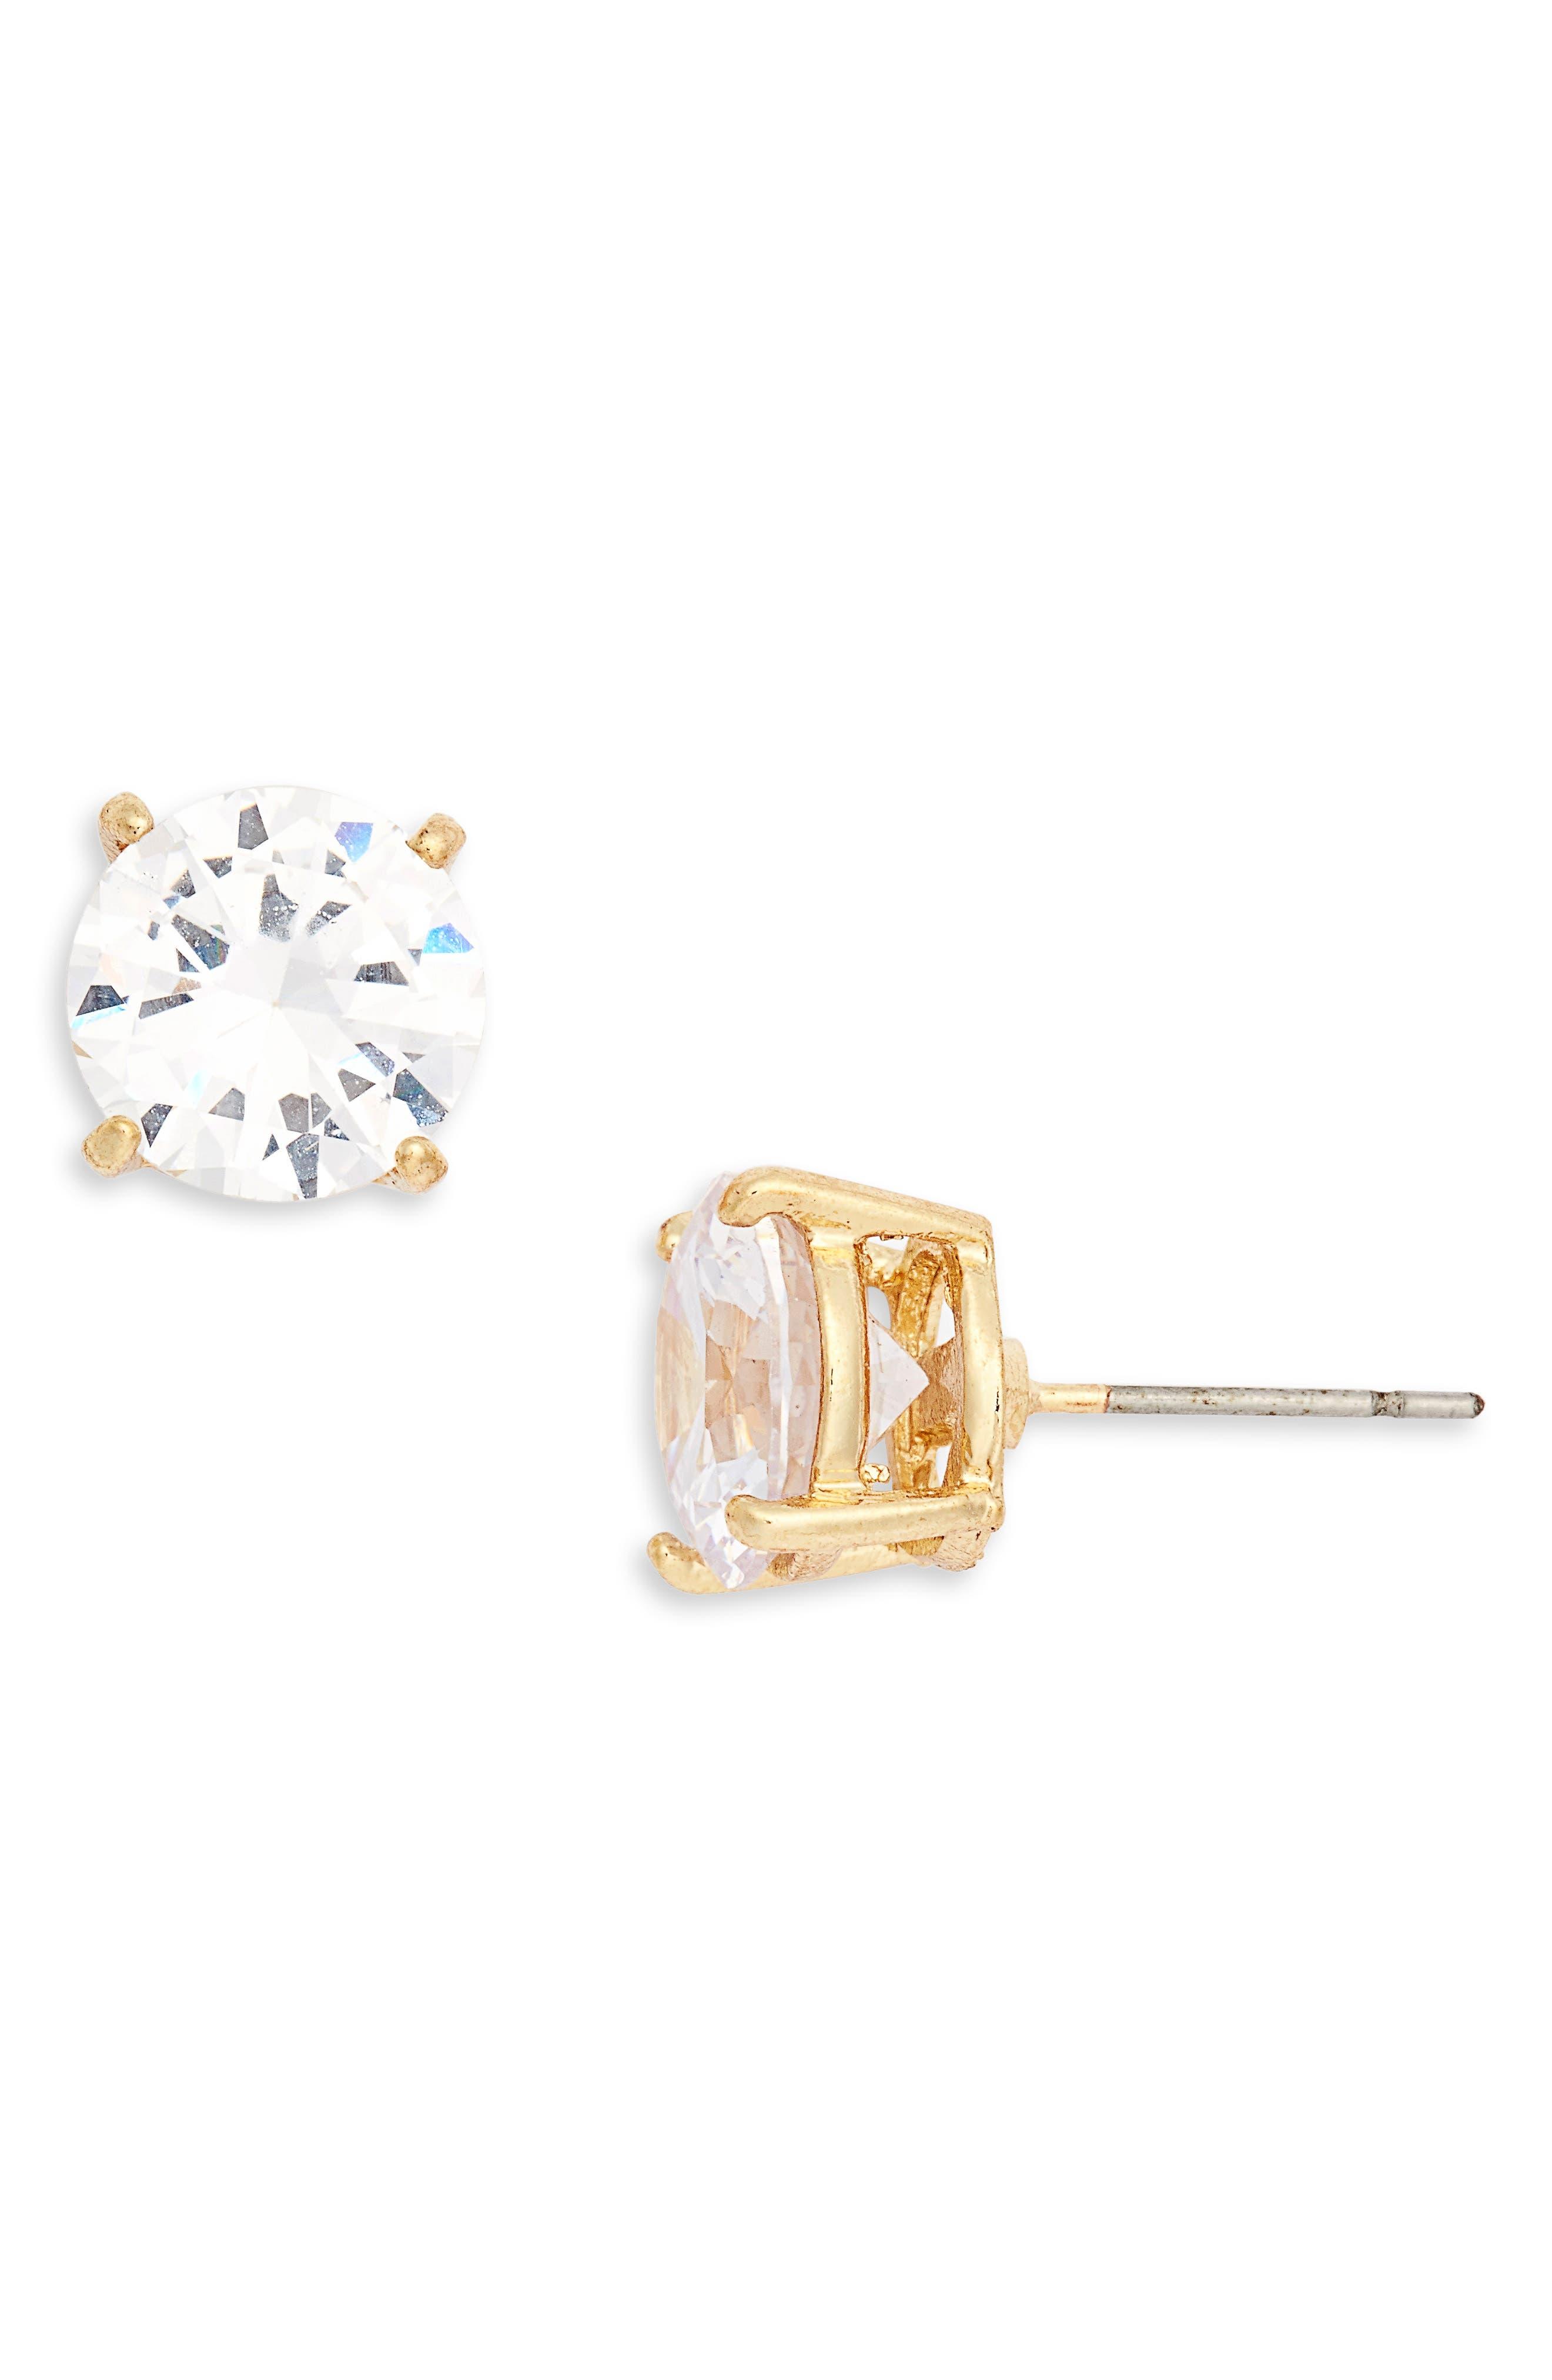 Stone Stud Earrings,                             Main thumbnail 1, color,                             Crystal